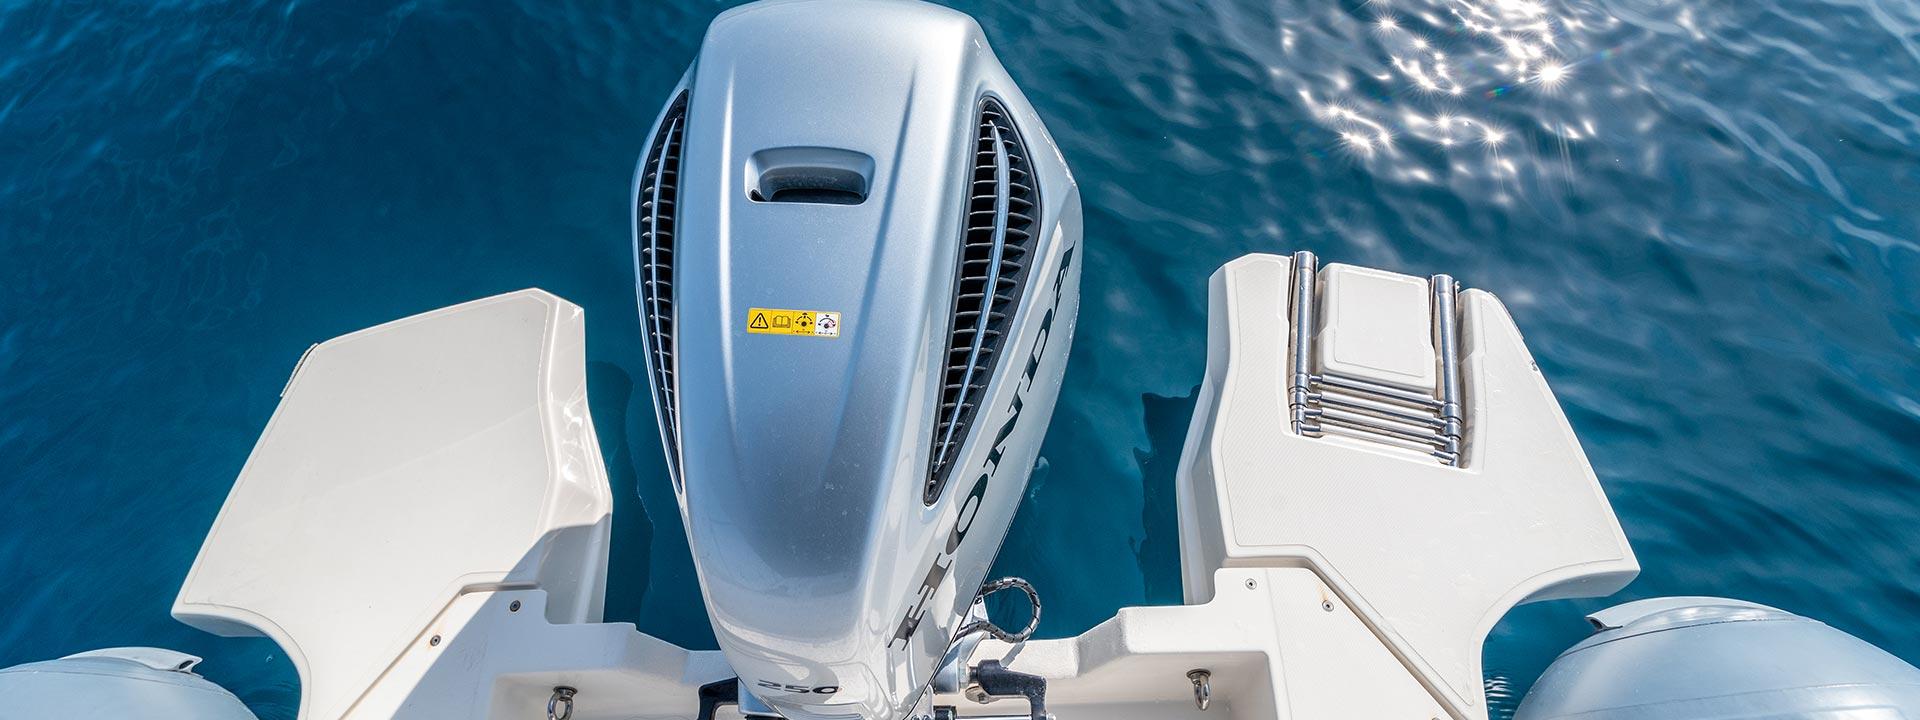 mayer-charter-boat-header-jeanneau-marlin-790-06